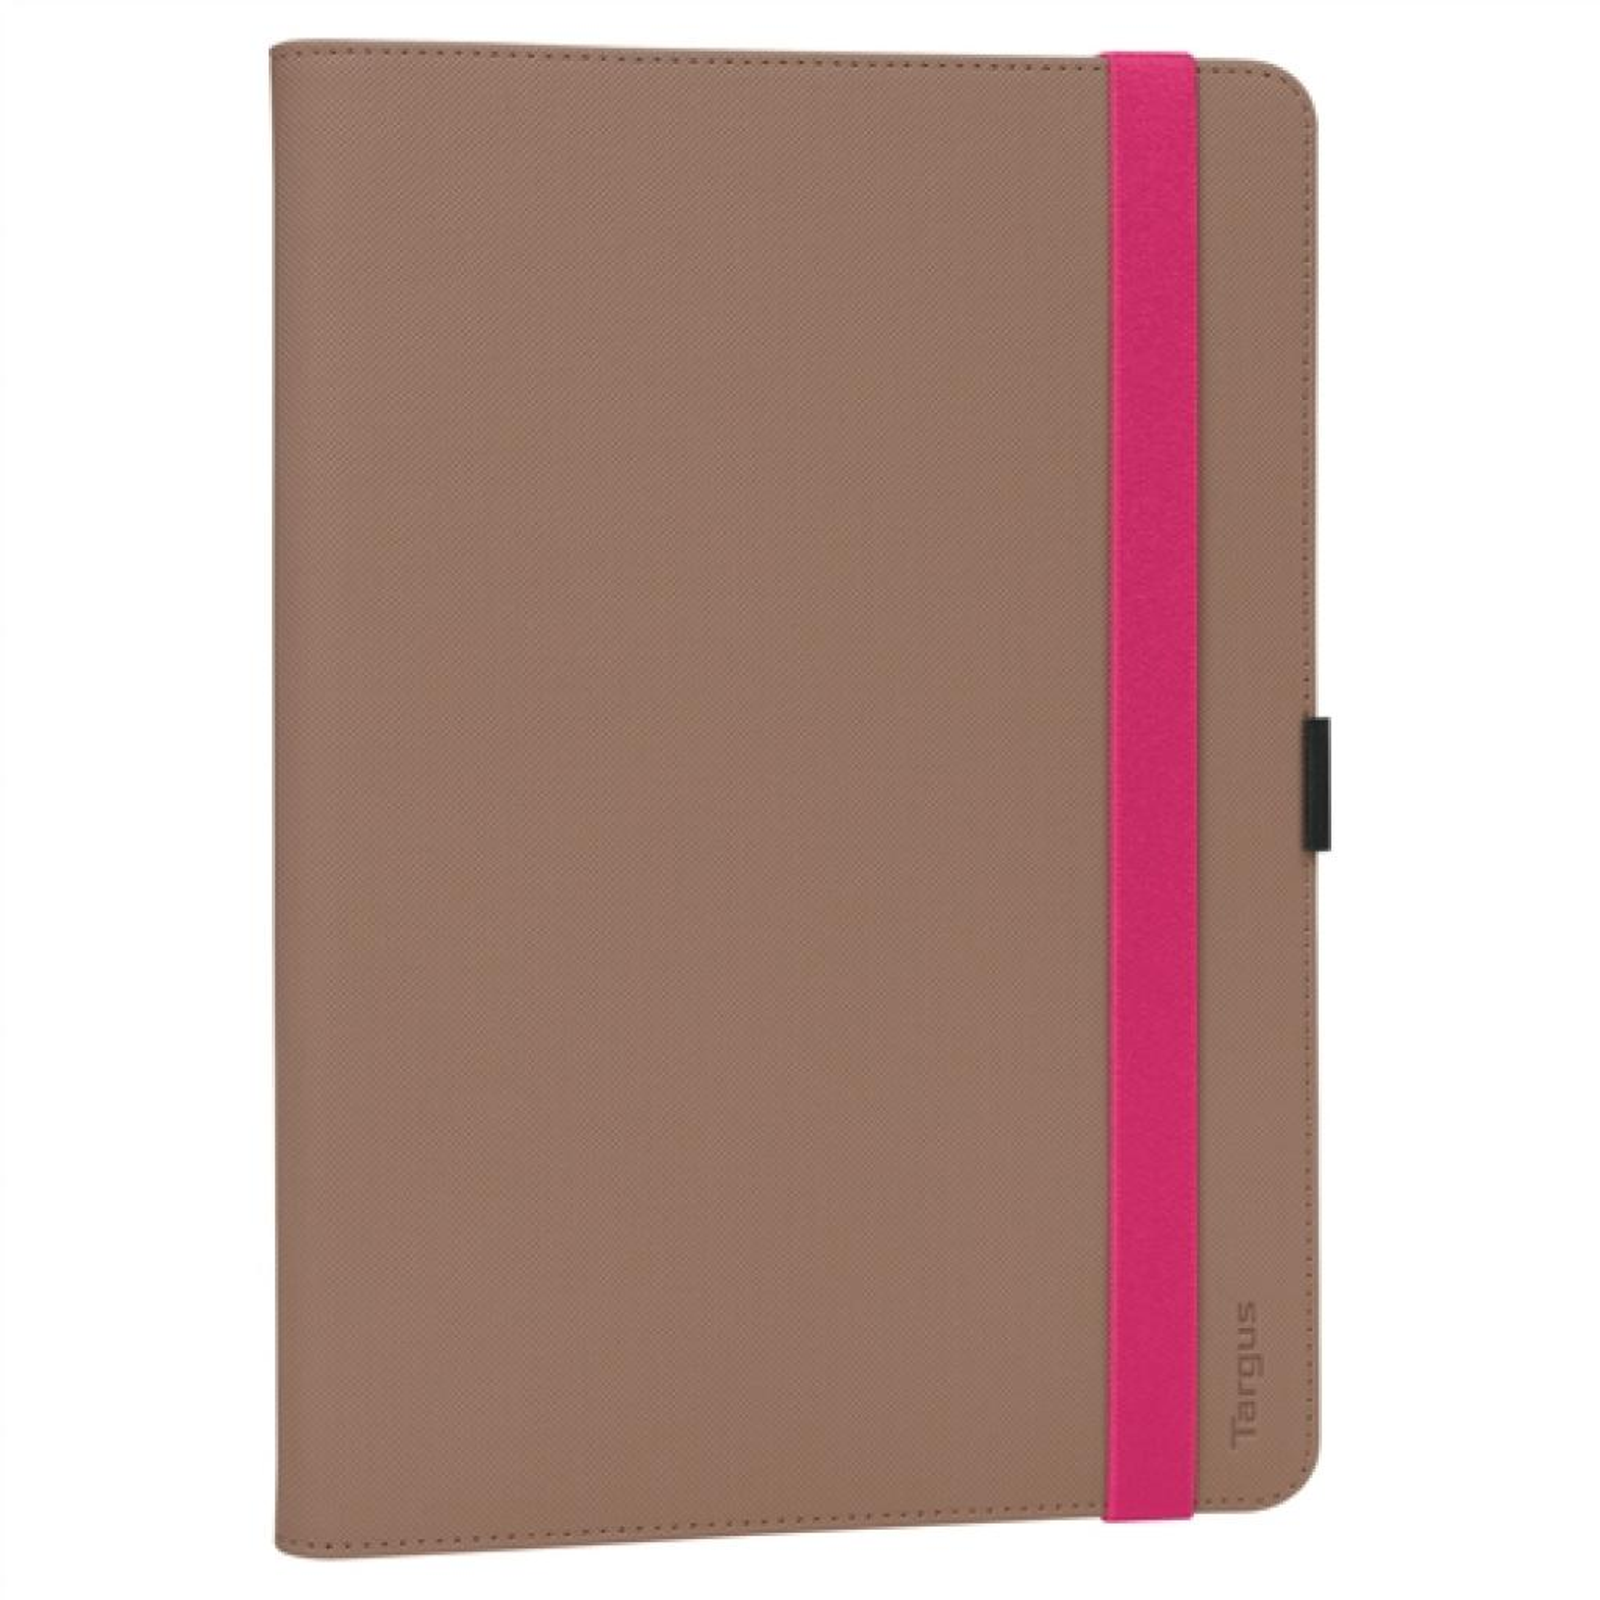 "Чехол для планшета Targus 9-10"" Universal BEIGE book (THZ33903EU)"